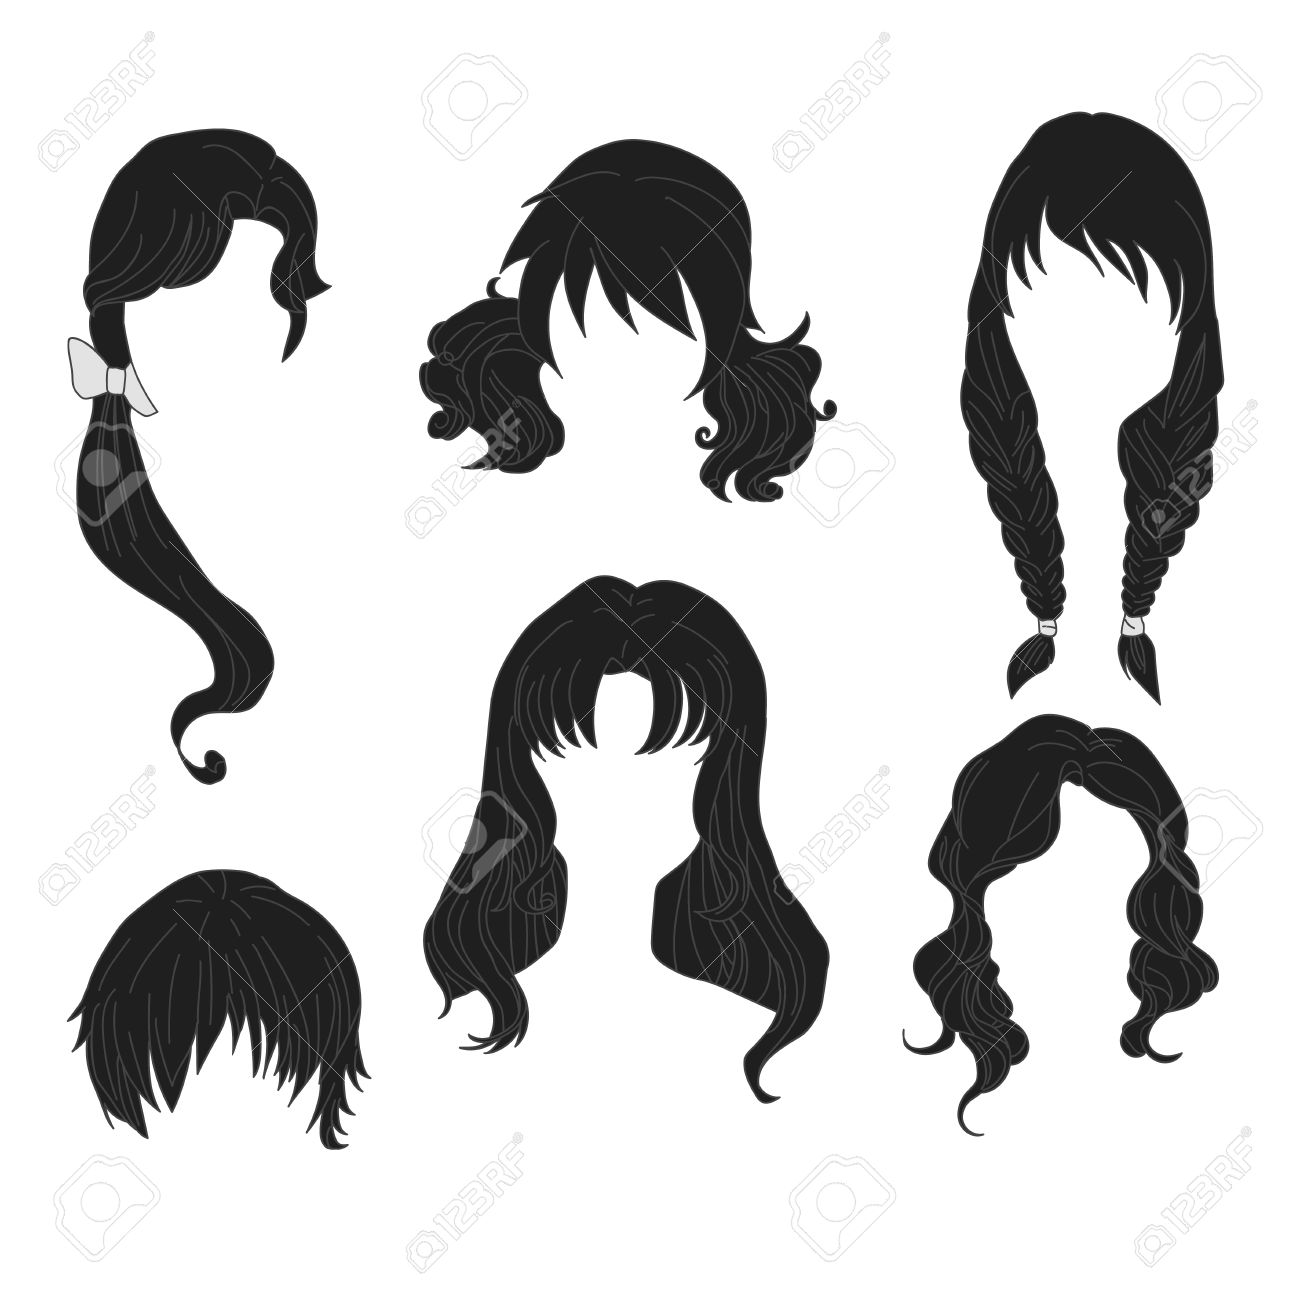 Peinados de mujer dibujo